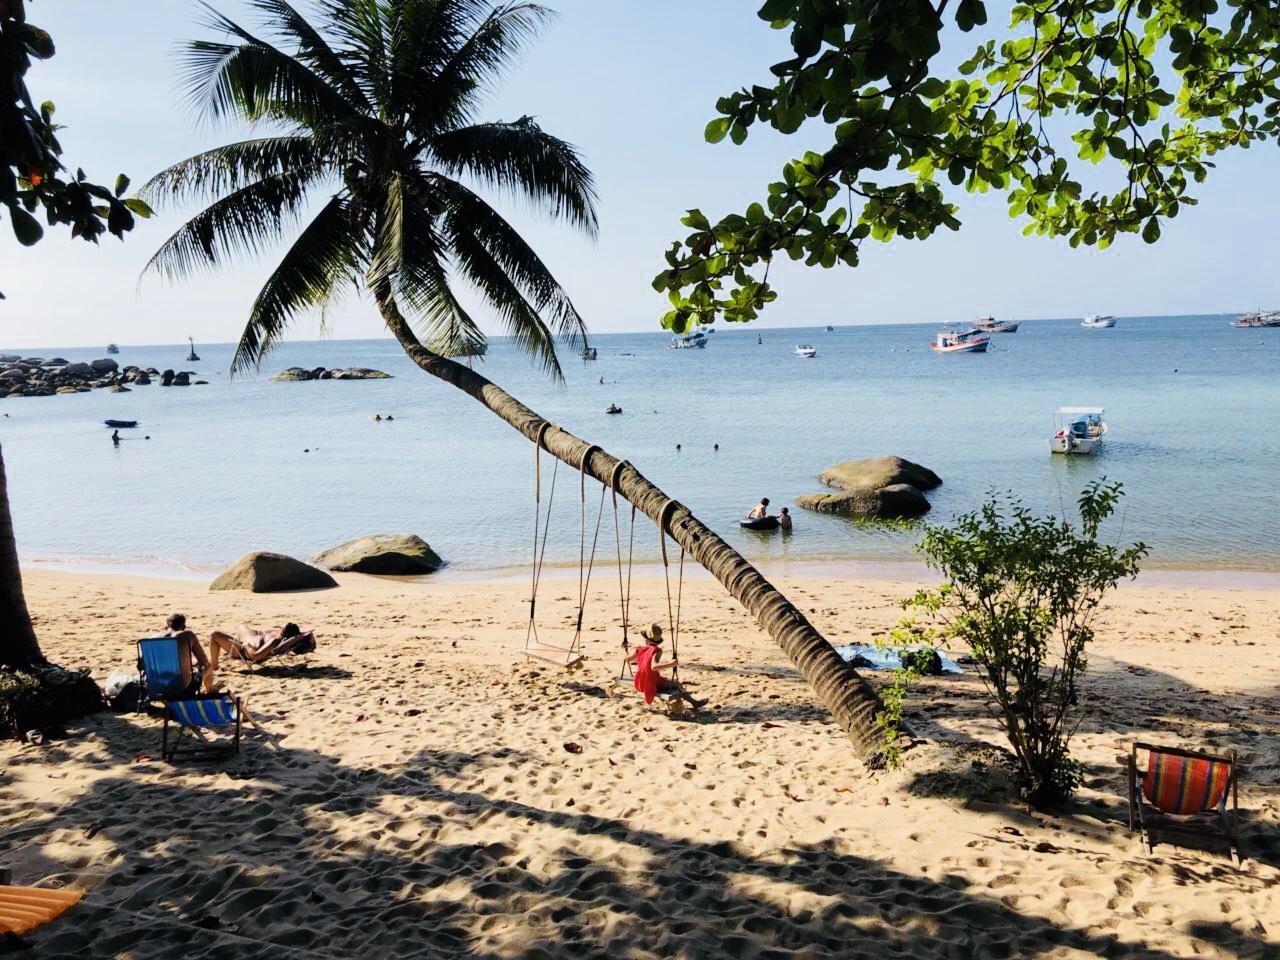 Unser Strandabschnitt vor der Koh Tao Royal Resort Anlage